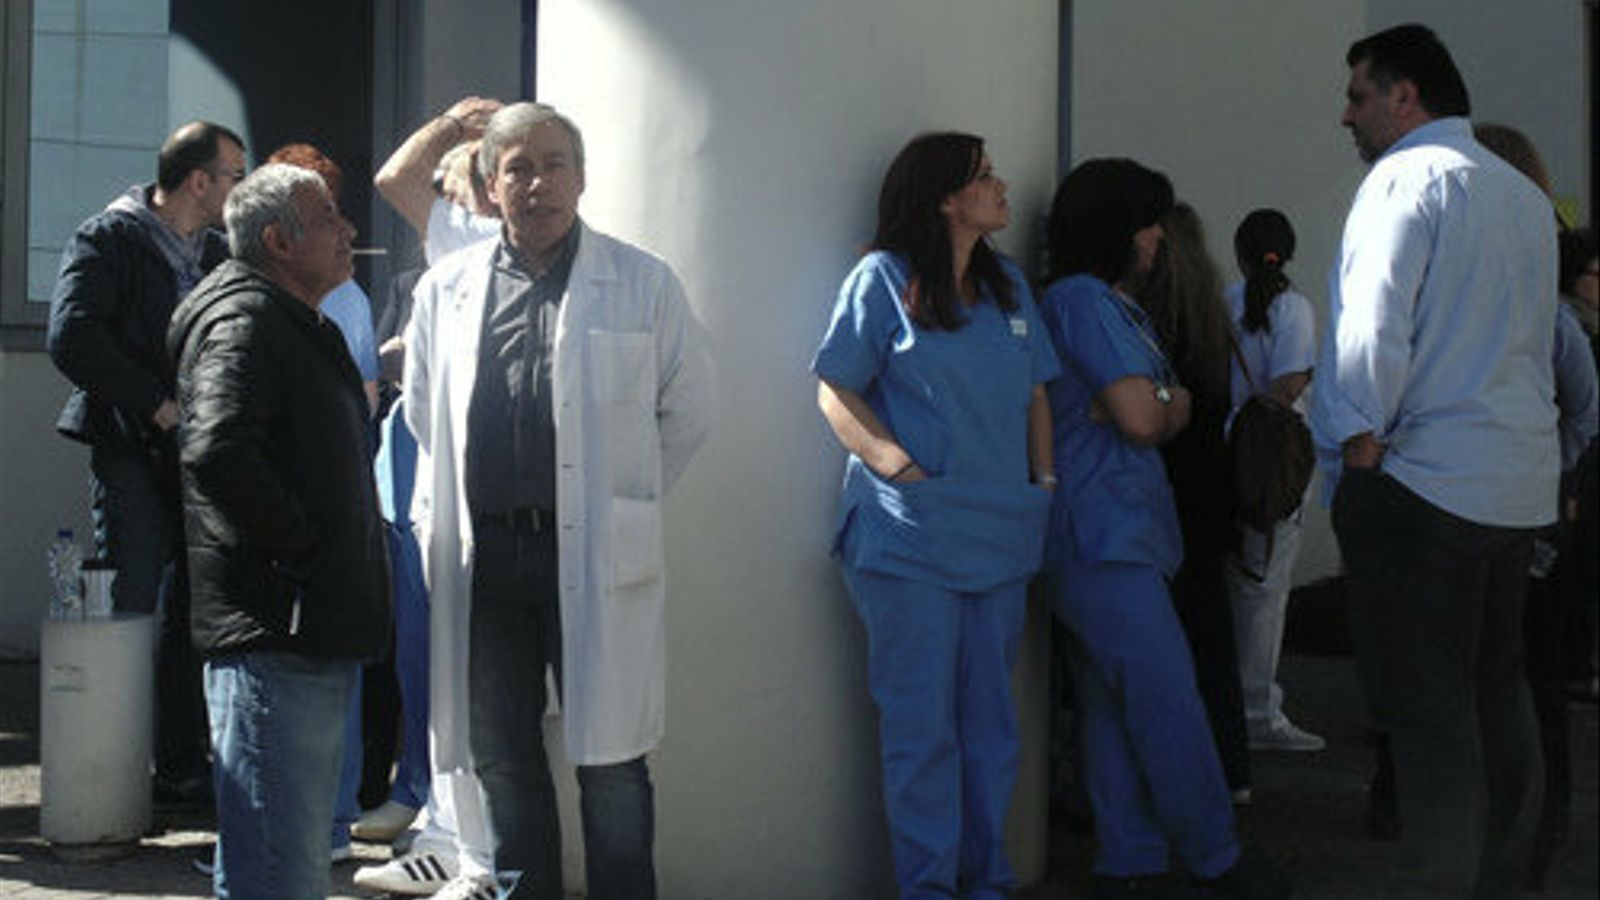 Retallades, refugiats i pobresa: la triple crisi de la sanitat grega